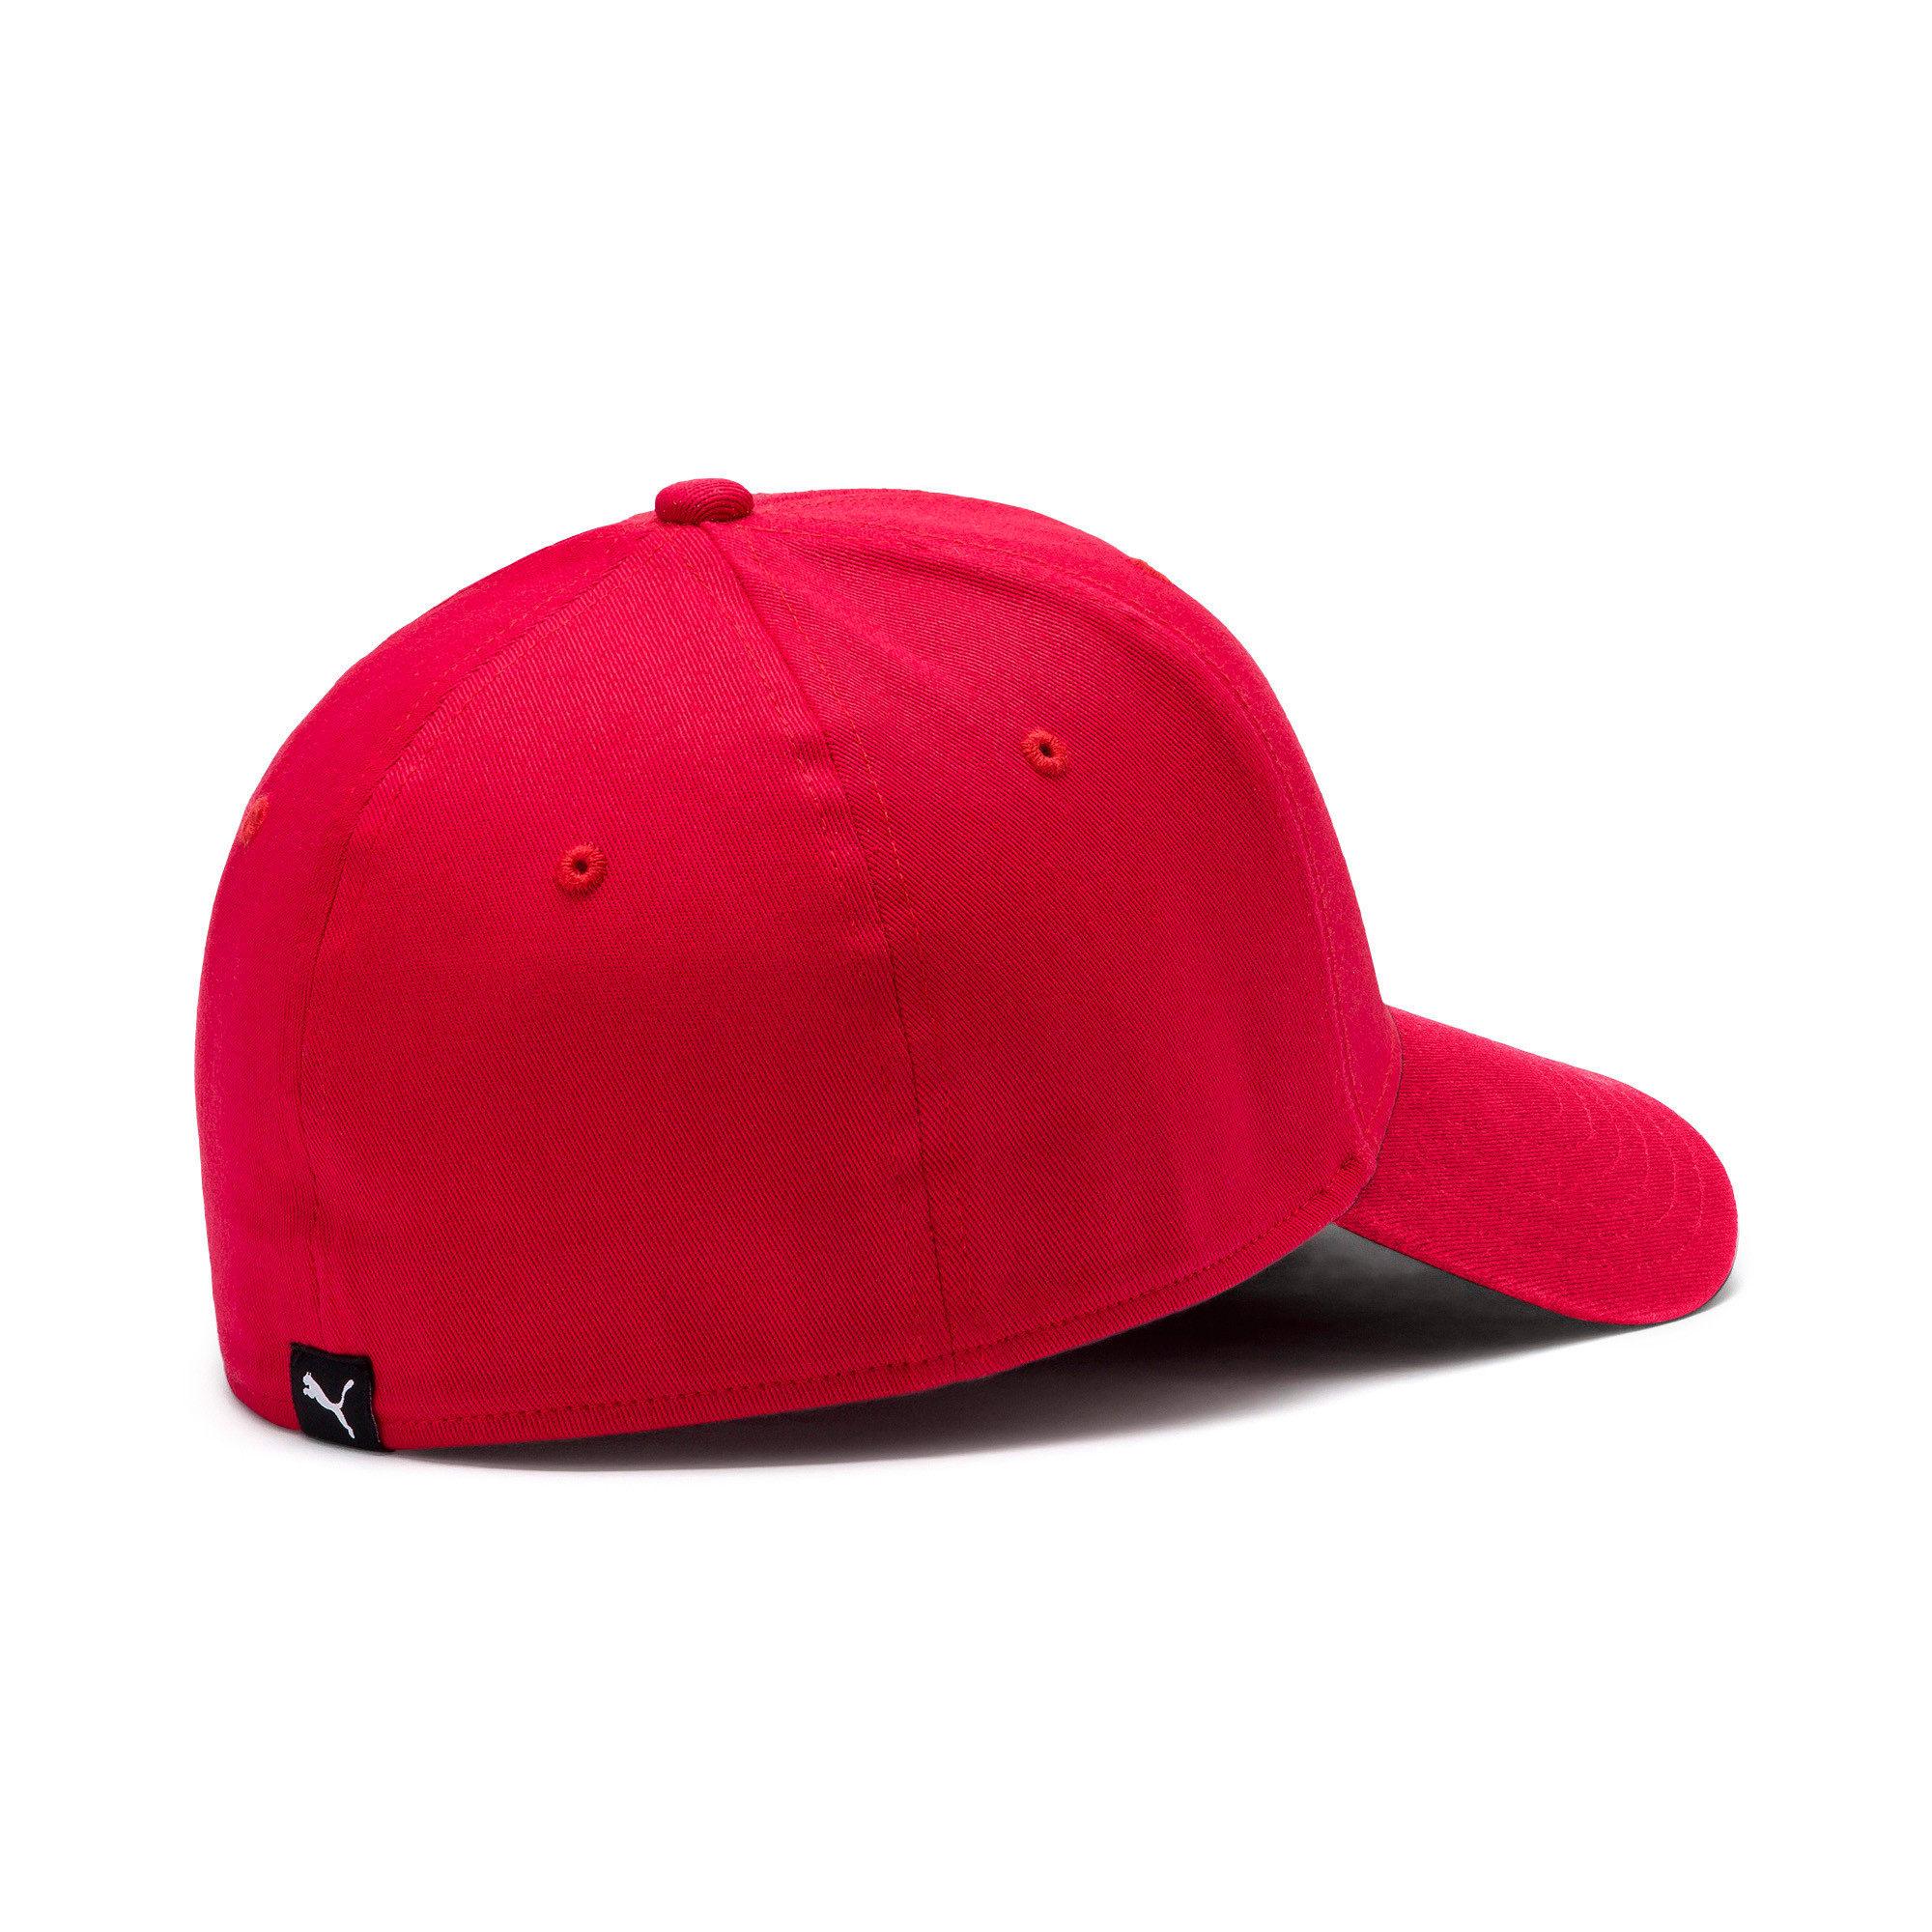 Thumbnail 3 of Stretchfit Baseball Cap, High Risk Red, medium